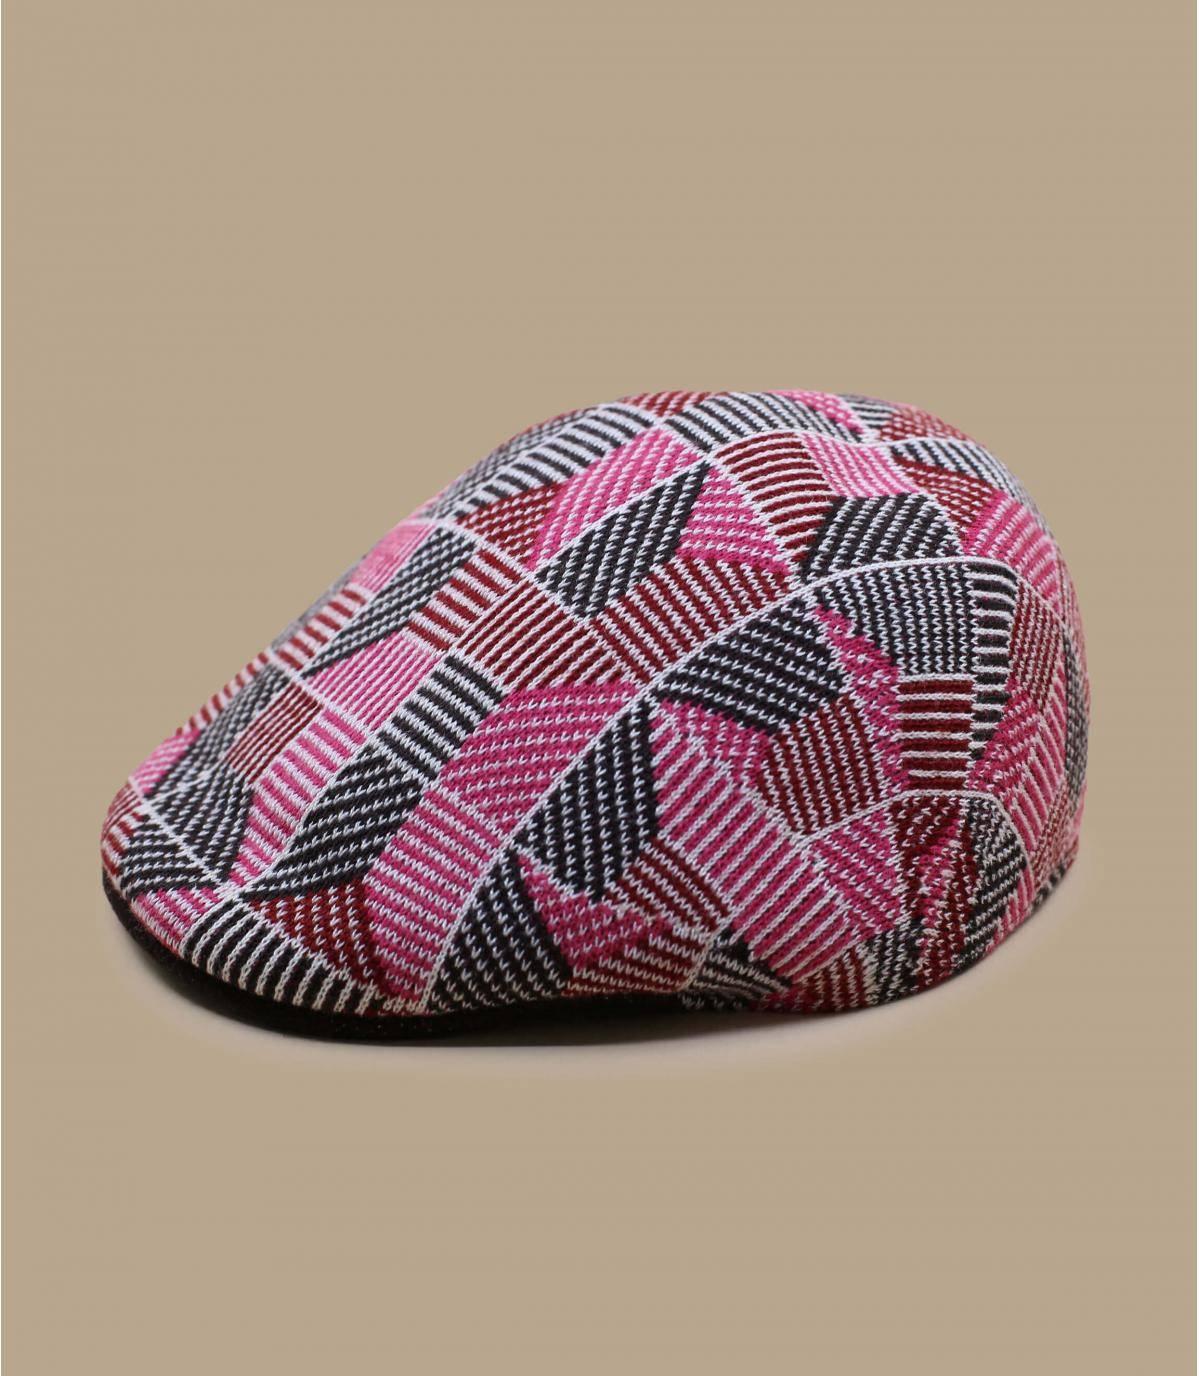 Details 507 Tiled electric pink - Abbildung 2